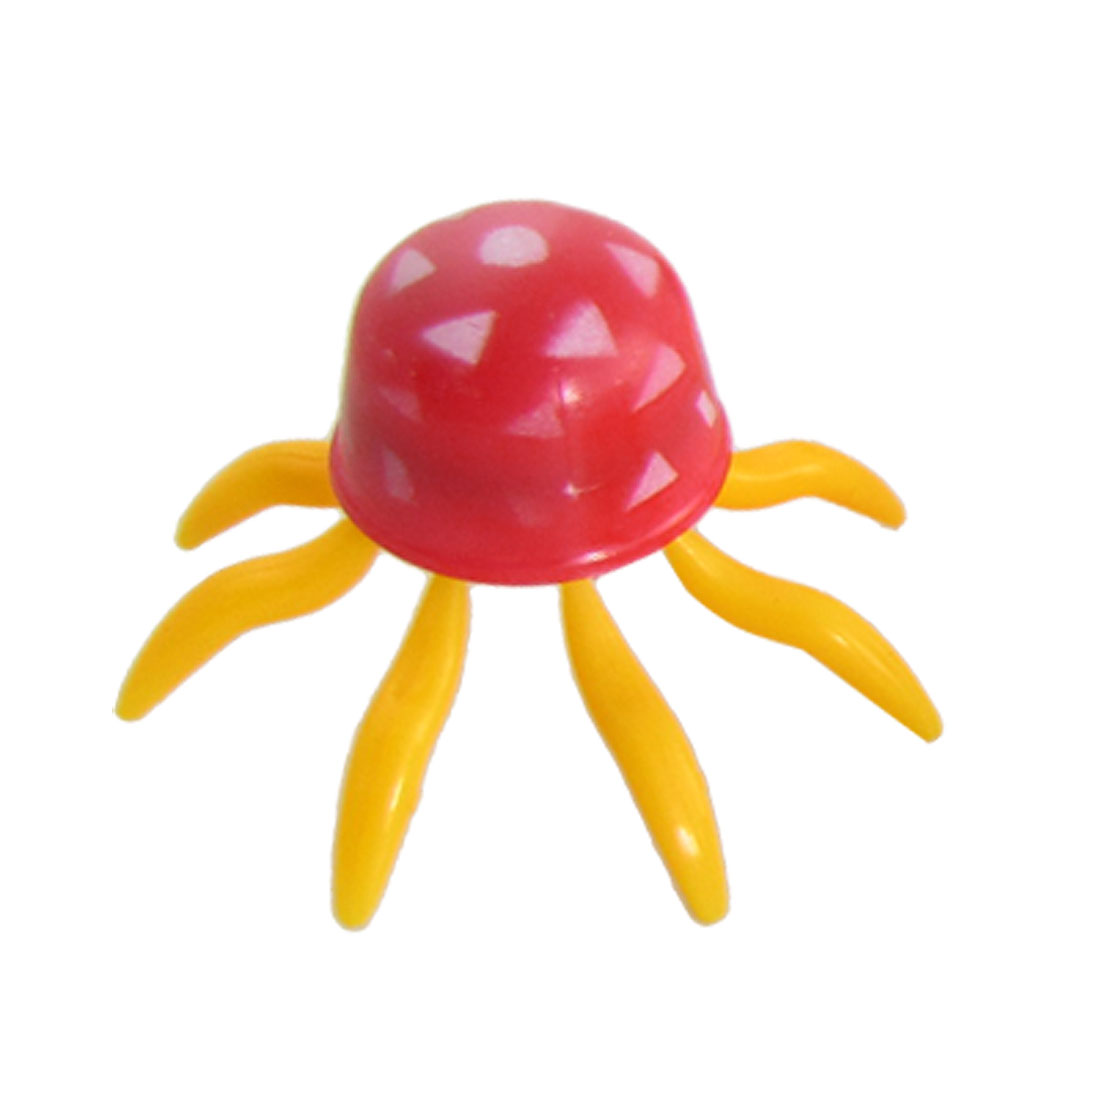 5 Pcs Artifical Jellyfish Plastic Decor for Aquarium Fish Tank